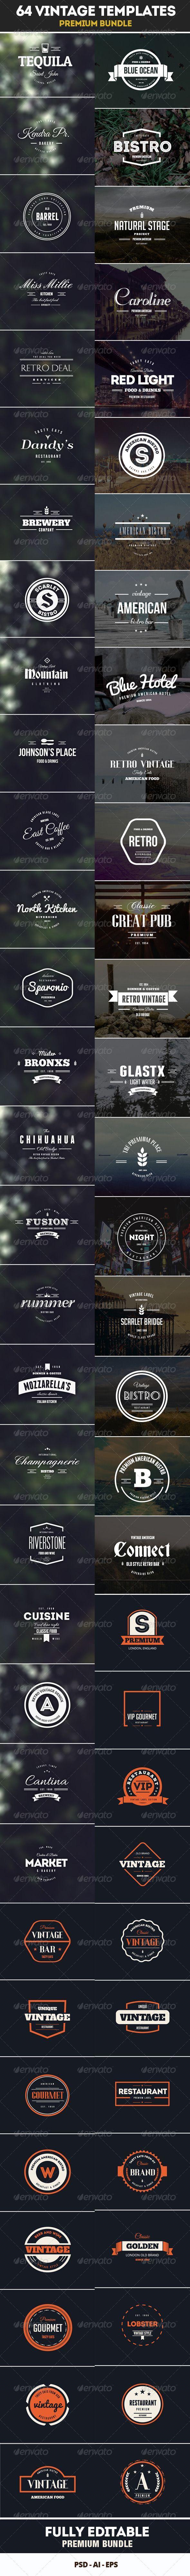 64 Vintage Labels & Badges Logos Bundle Template | Buy and Download: http://graphicriver.net/item/64-vintage-labels-badges-logos-bundle/7993973?WT.ac=category_thumb&WT.z_author=designdistrictmx&ref=ksioks: